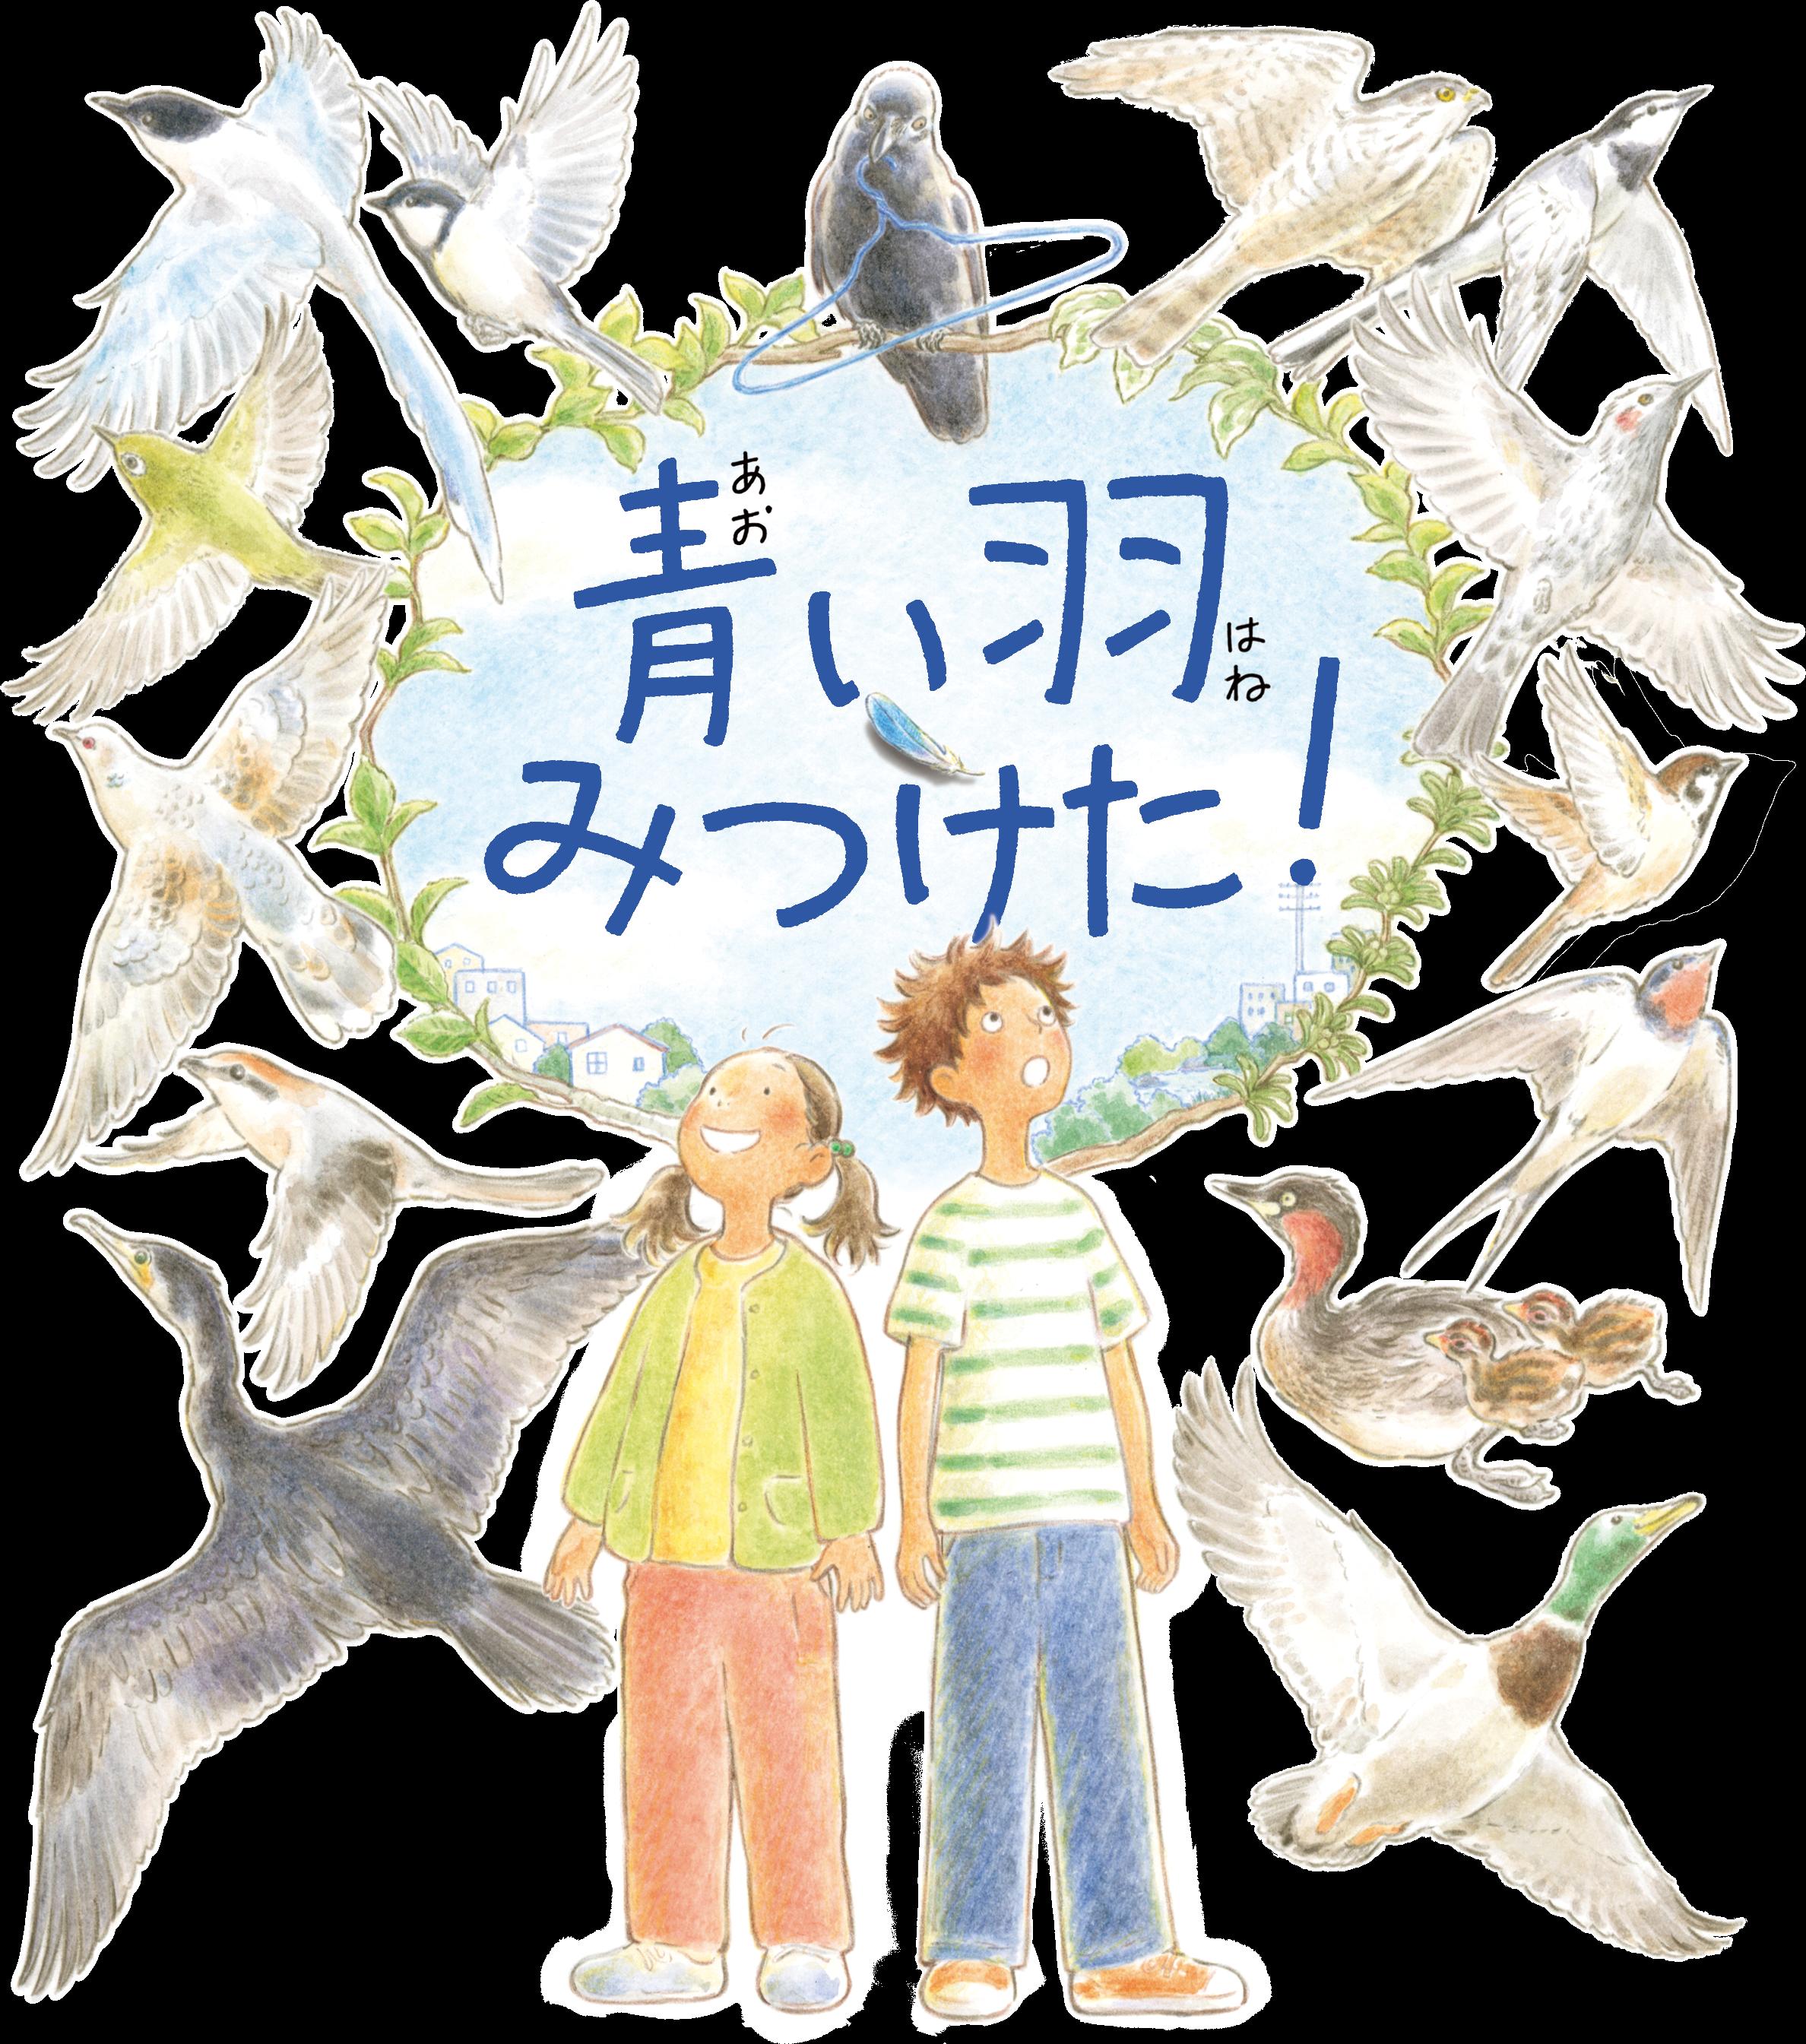 TVアニメ「青い羽みつけた!」ビジュアル